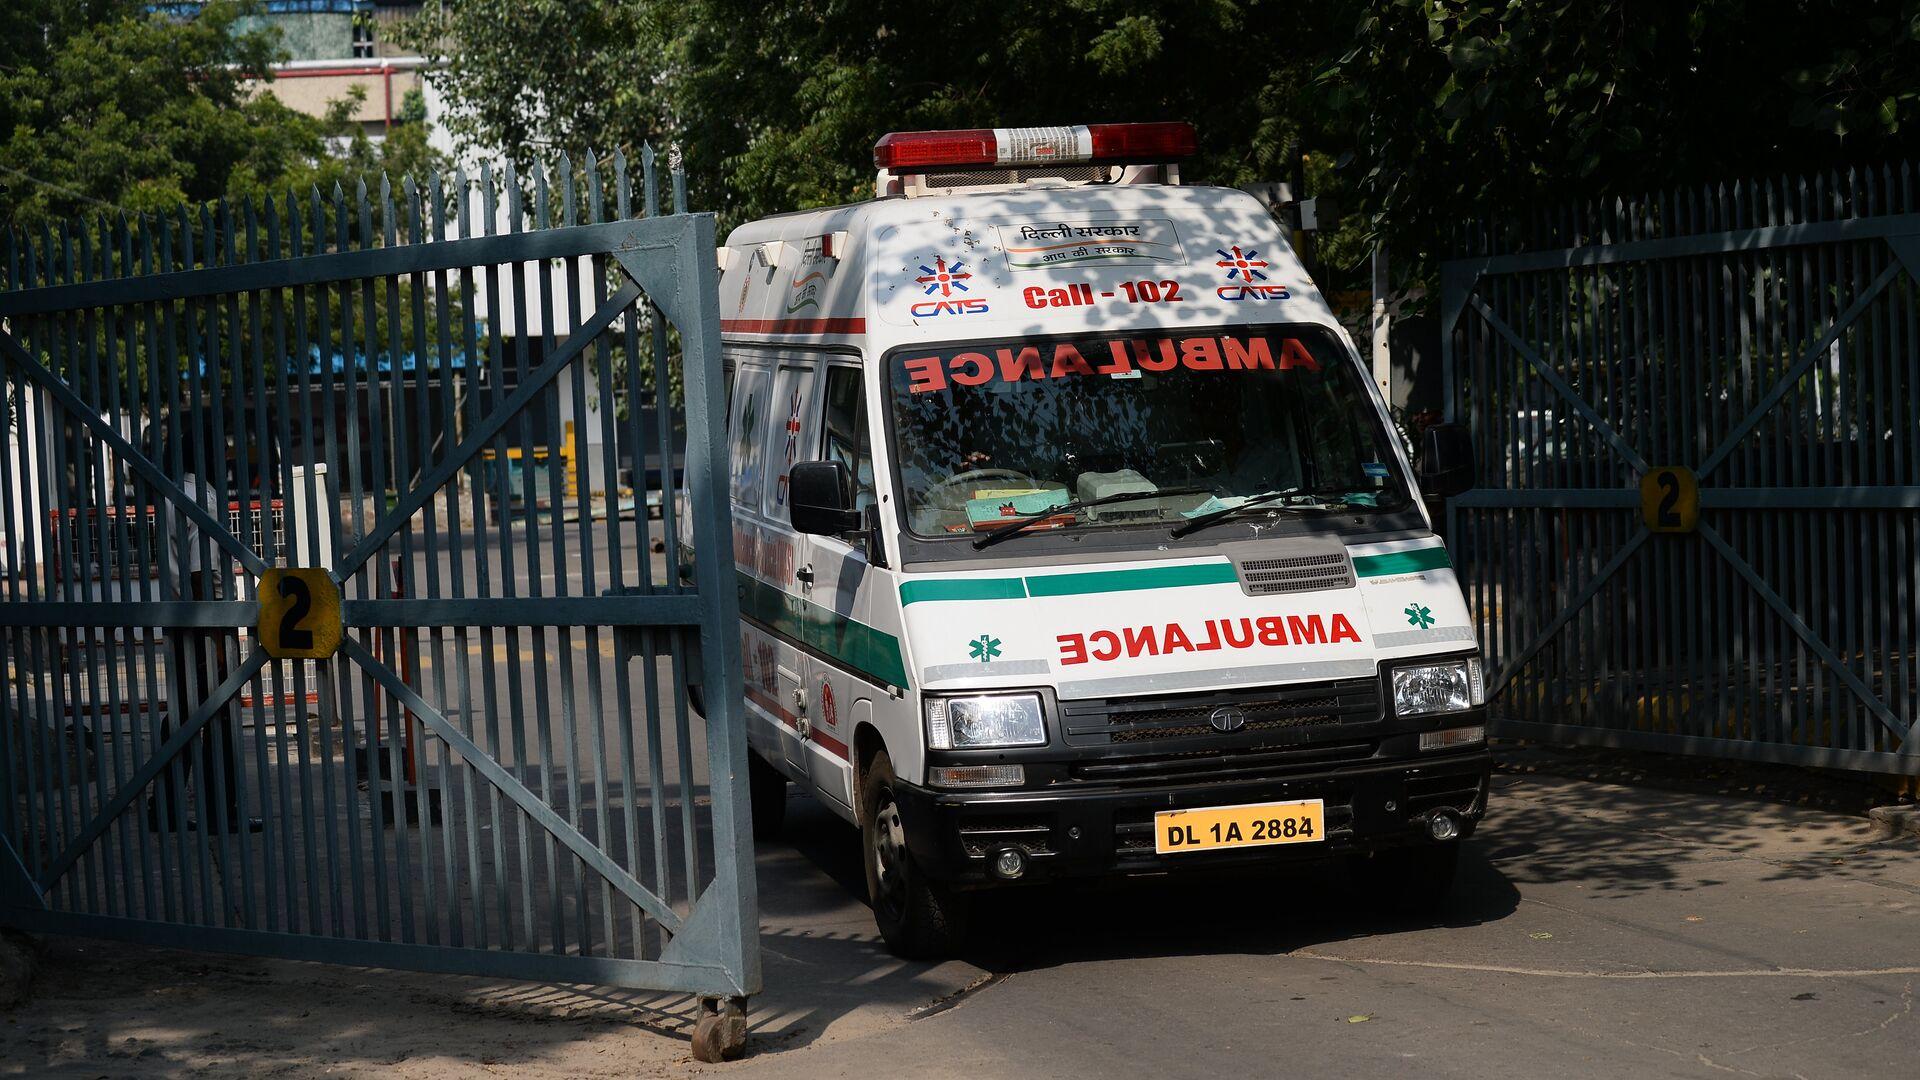 India Ambulance - Sputnik International, 1920, 23.07.2021